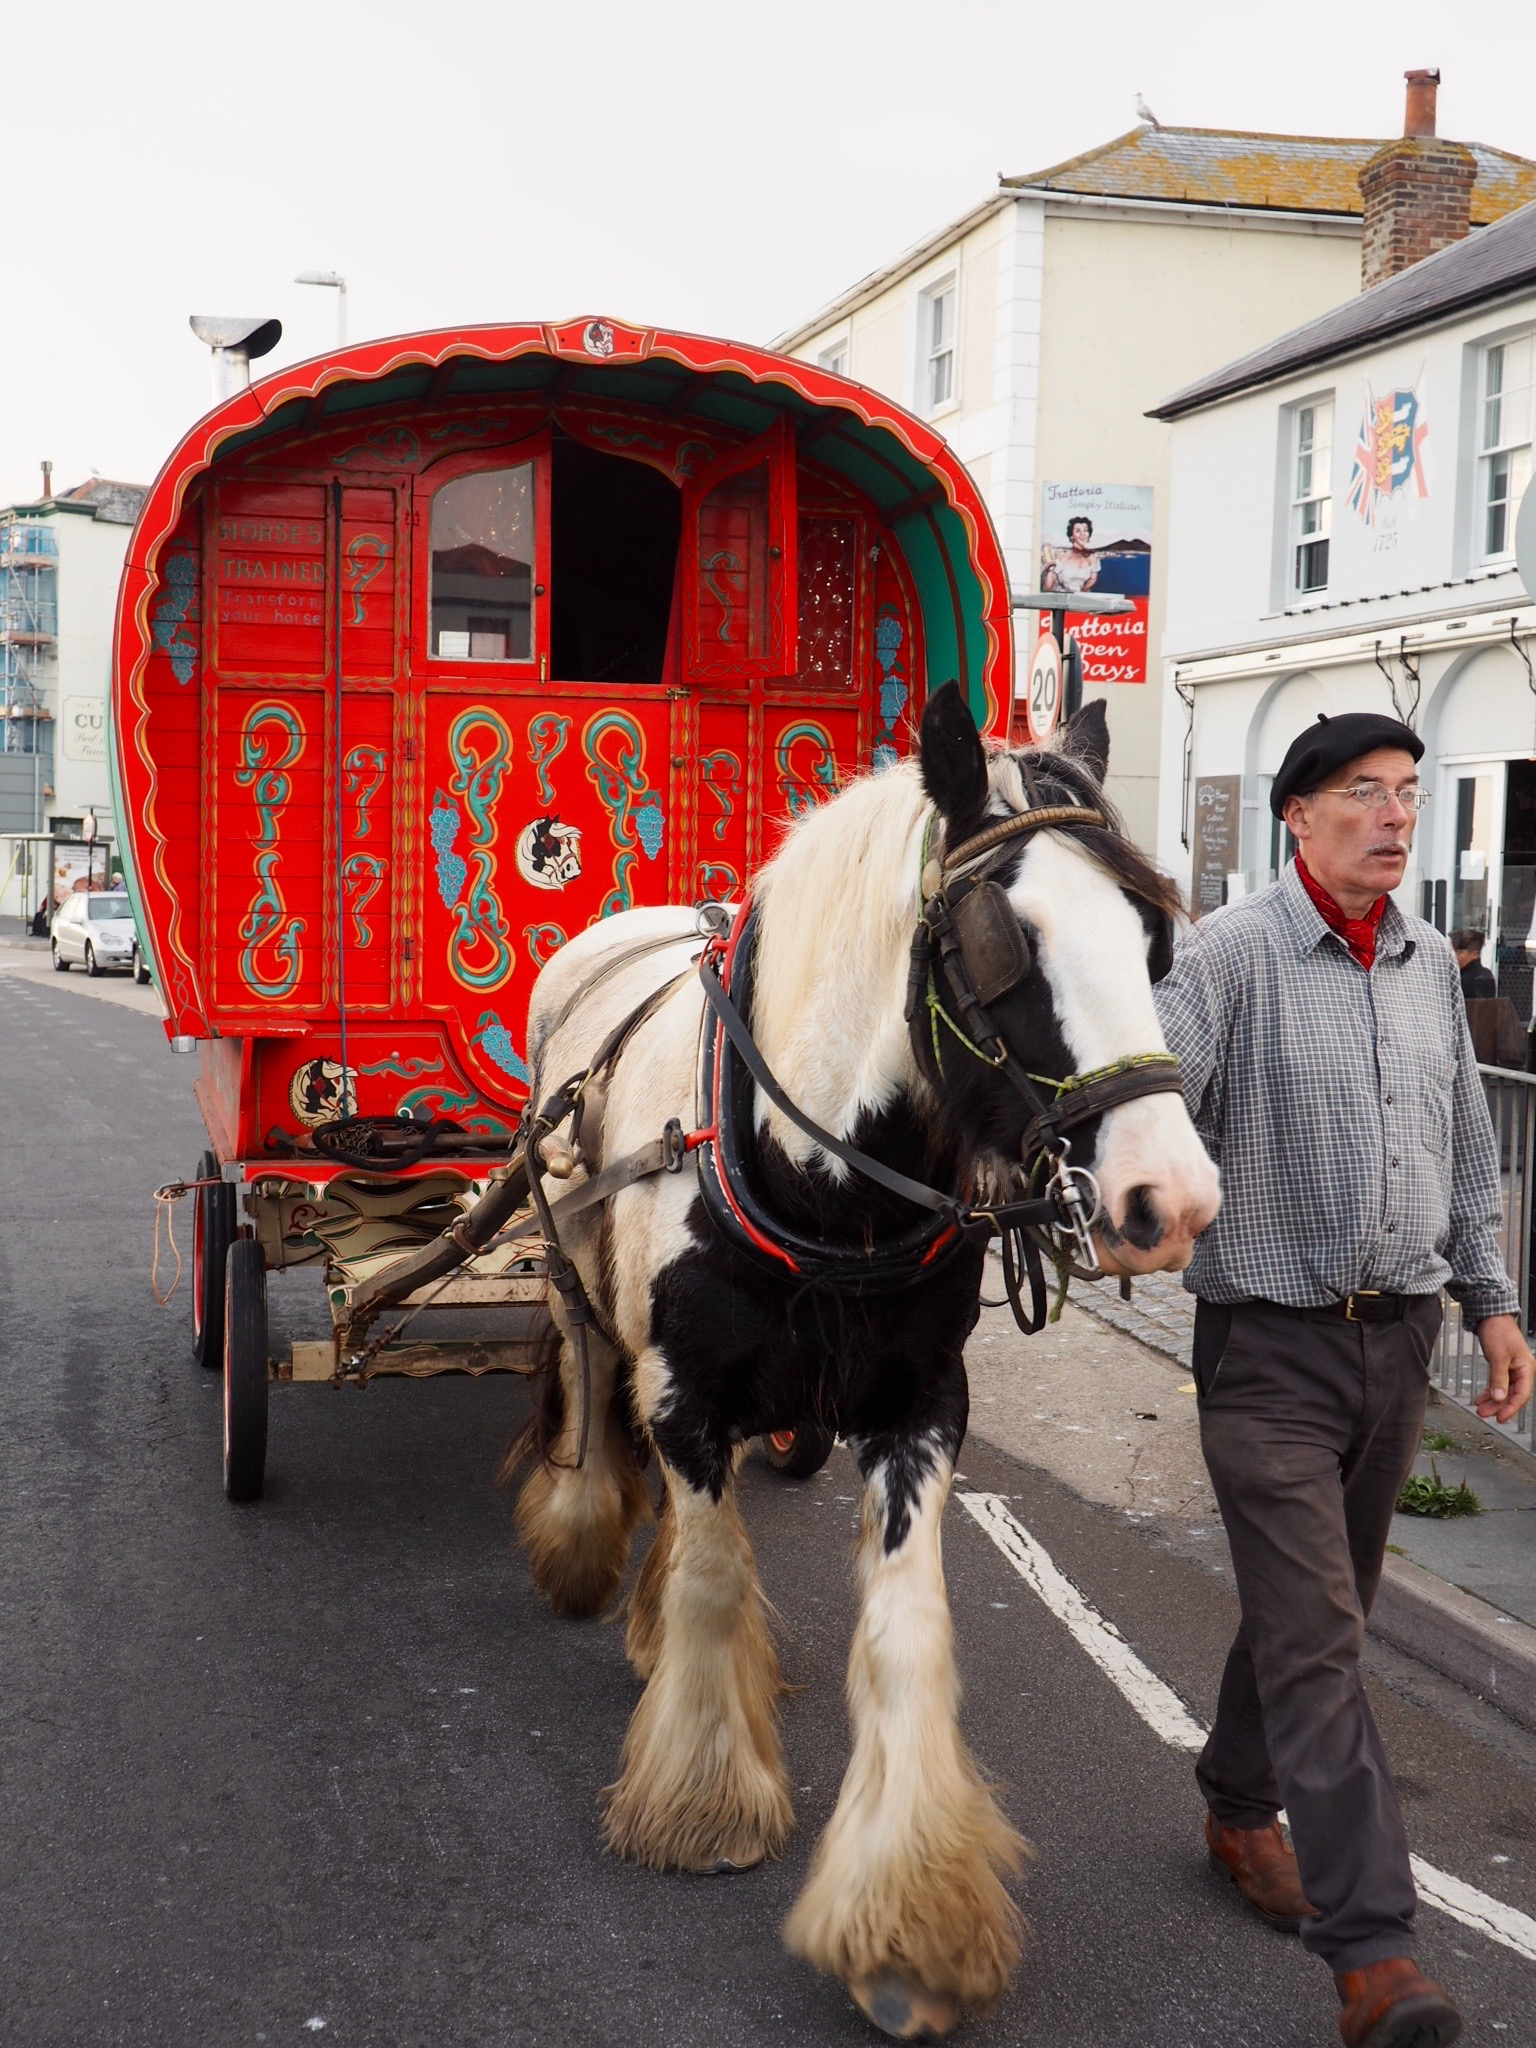 Horse & cart in Hastings.